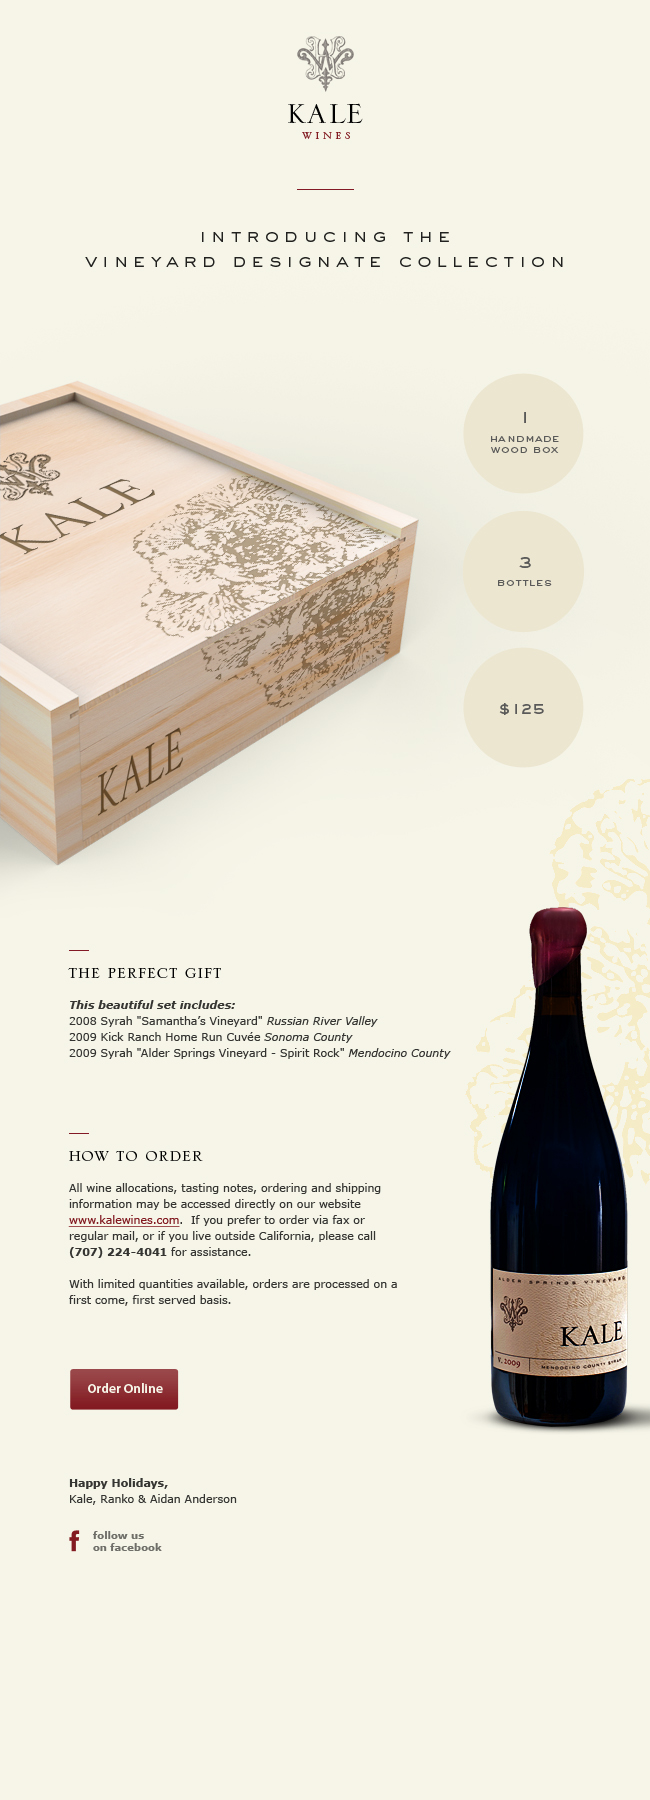 Vineyard Designate Collection